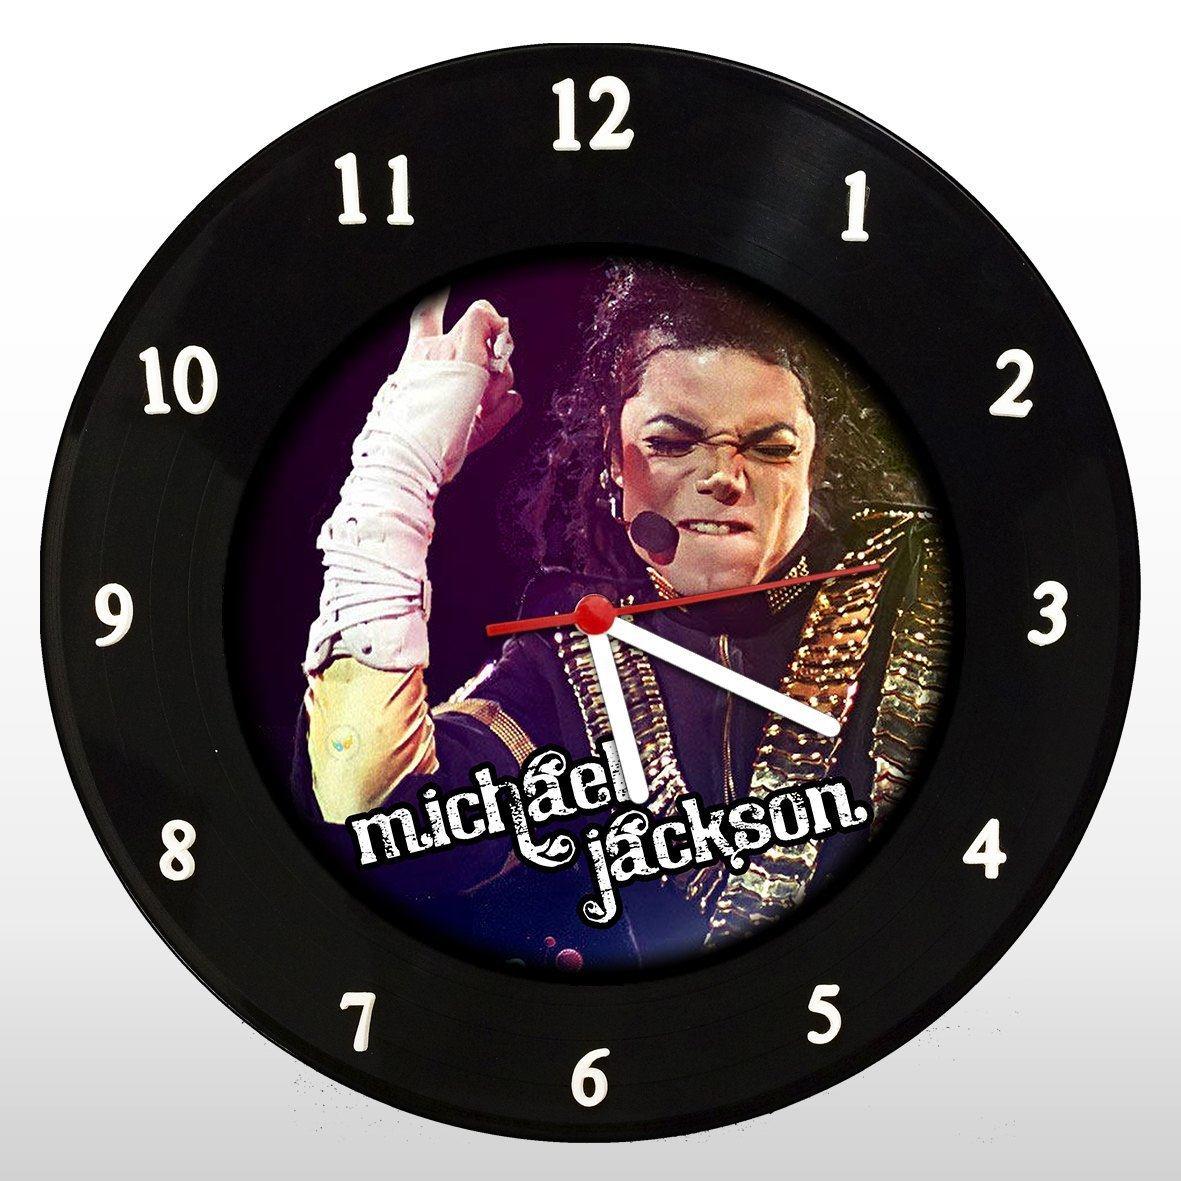 Michael Jackson - Relógio de Parede em Disco de Vinil - Mr. Rock